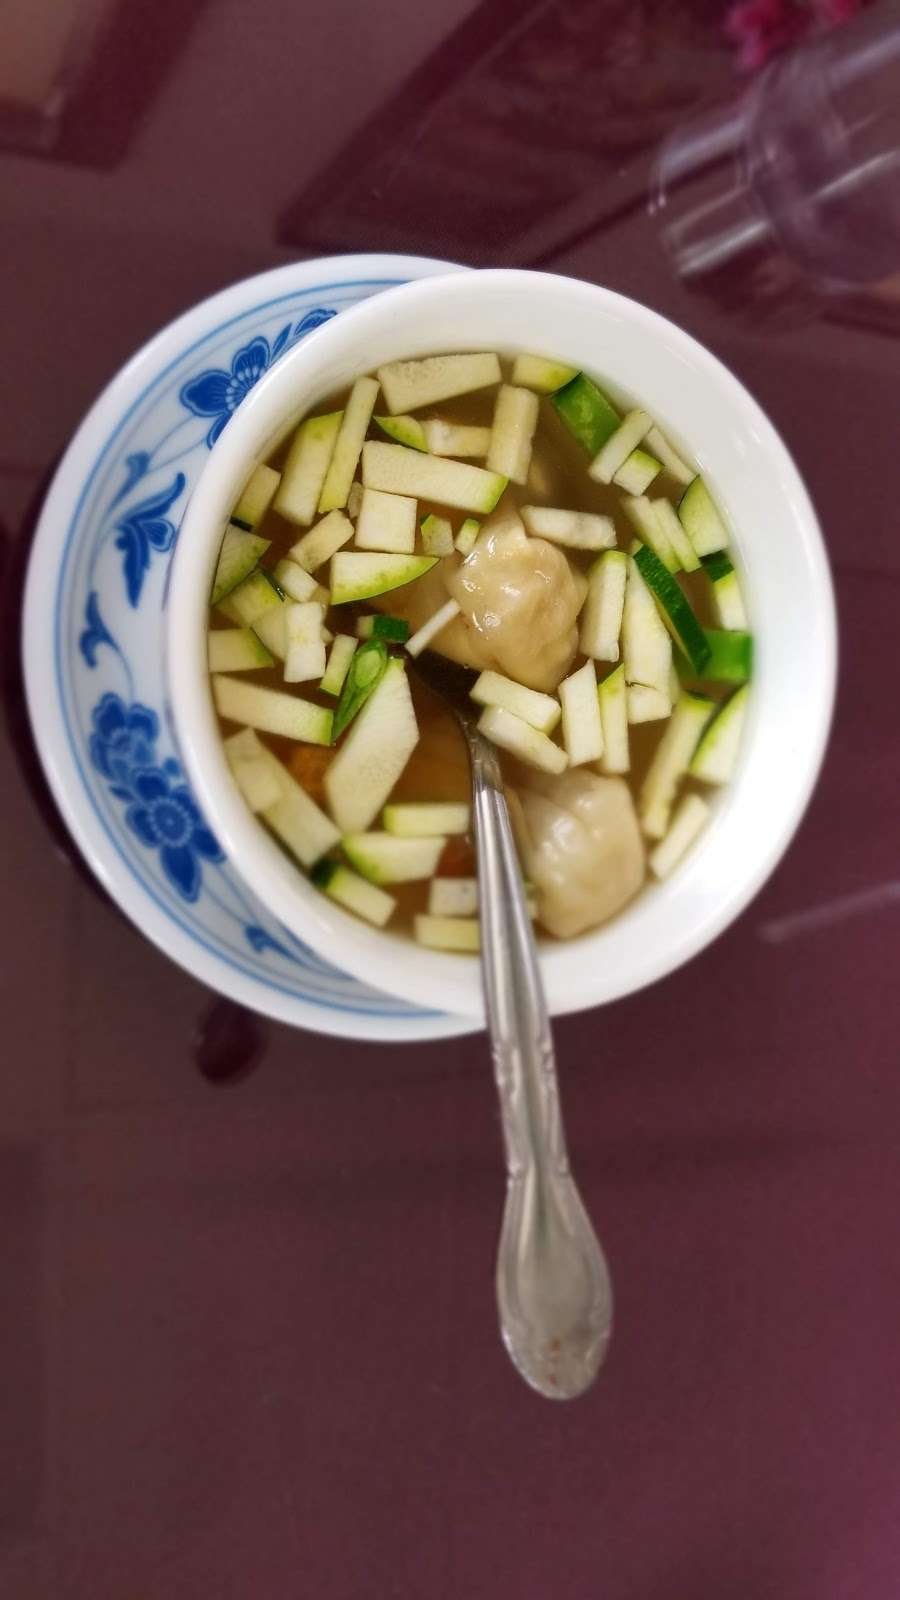 China Village - restaurant  | Photo 10 of 10 | Address: 60693 US Hwy 285, Bailey, CO 80421, USA | Phone: (303) 838-3308